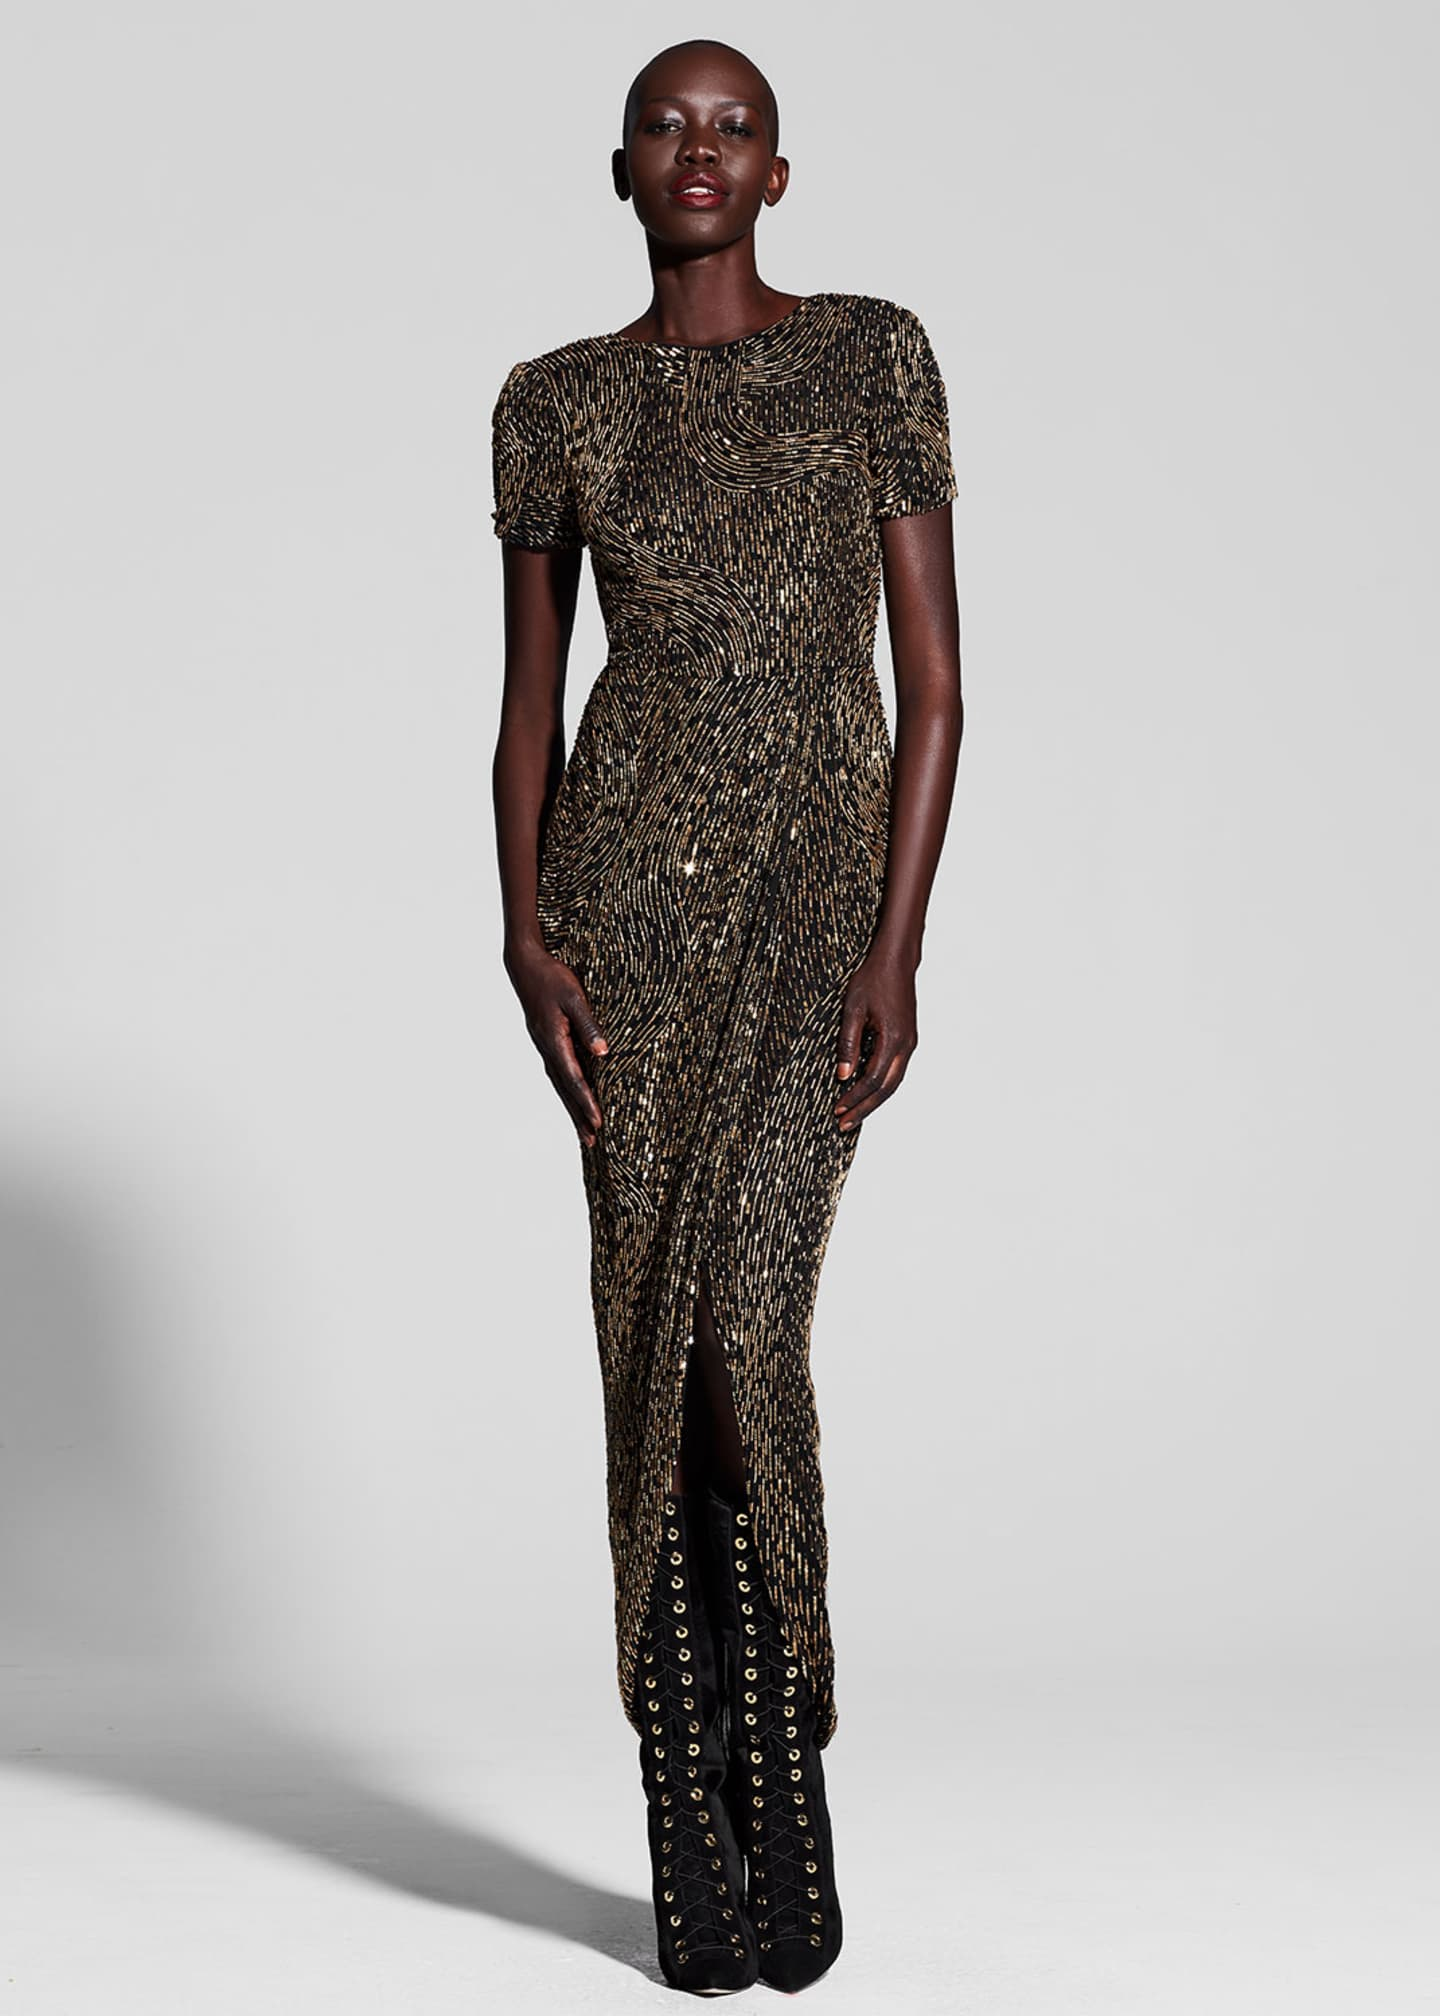 J. Mendel Metallic Beaded Short-Sleeve Gown, Multi